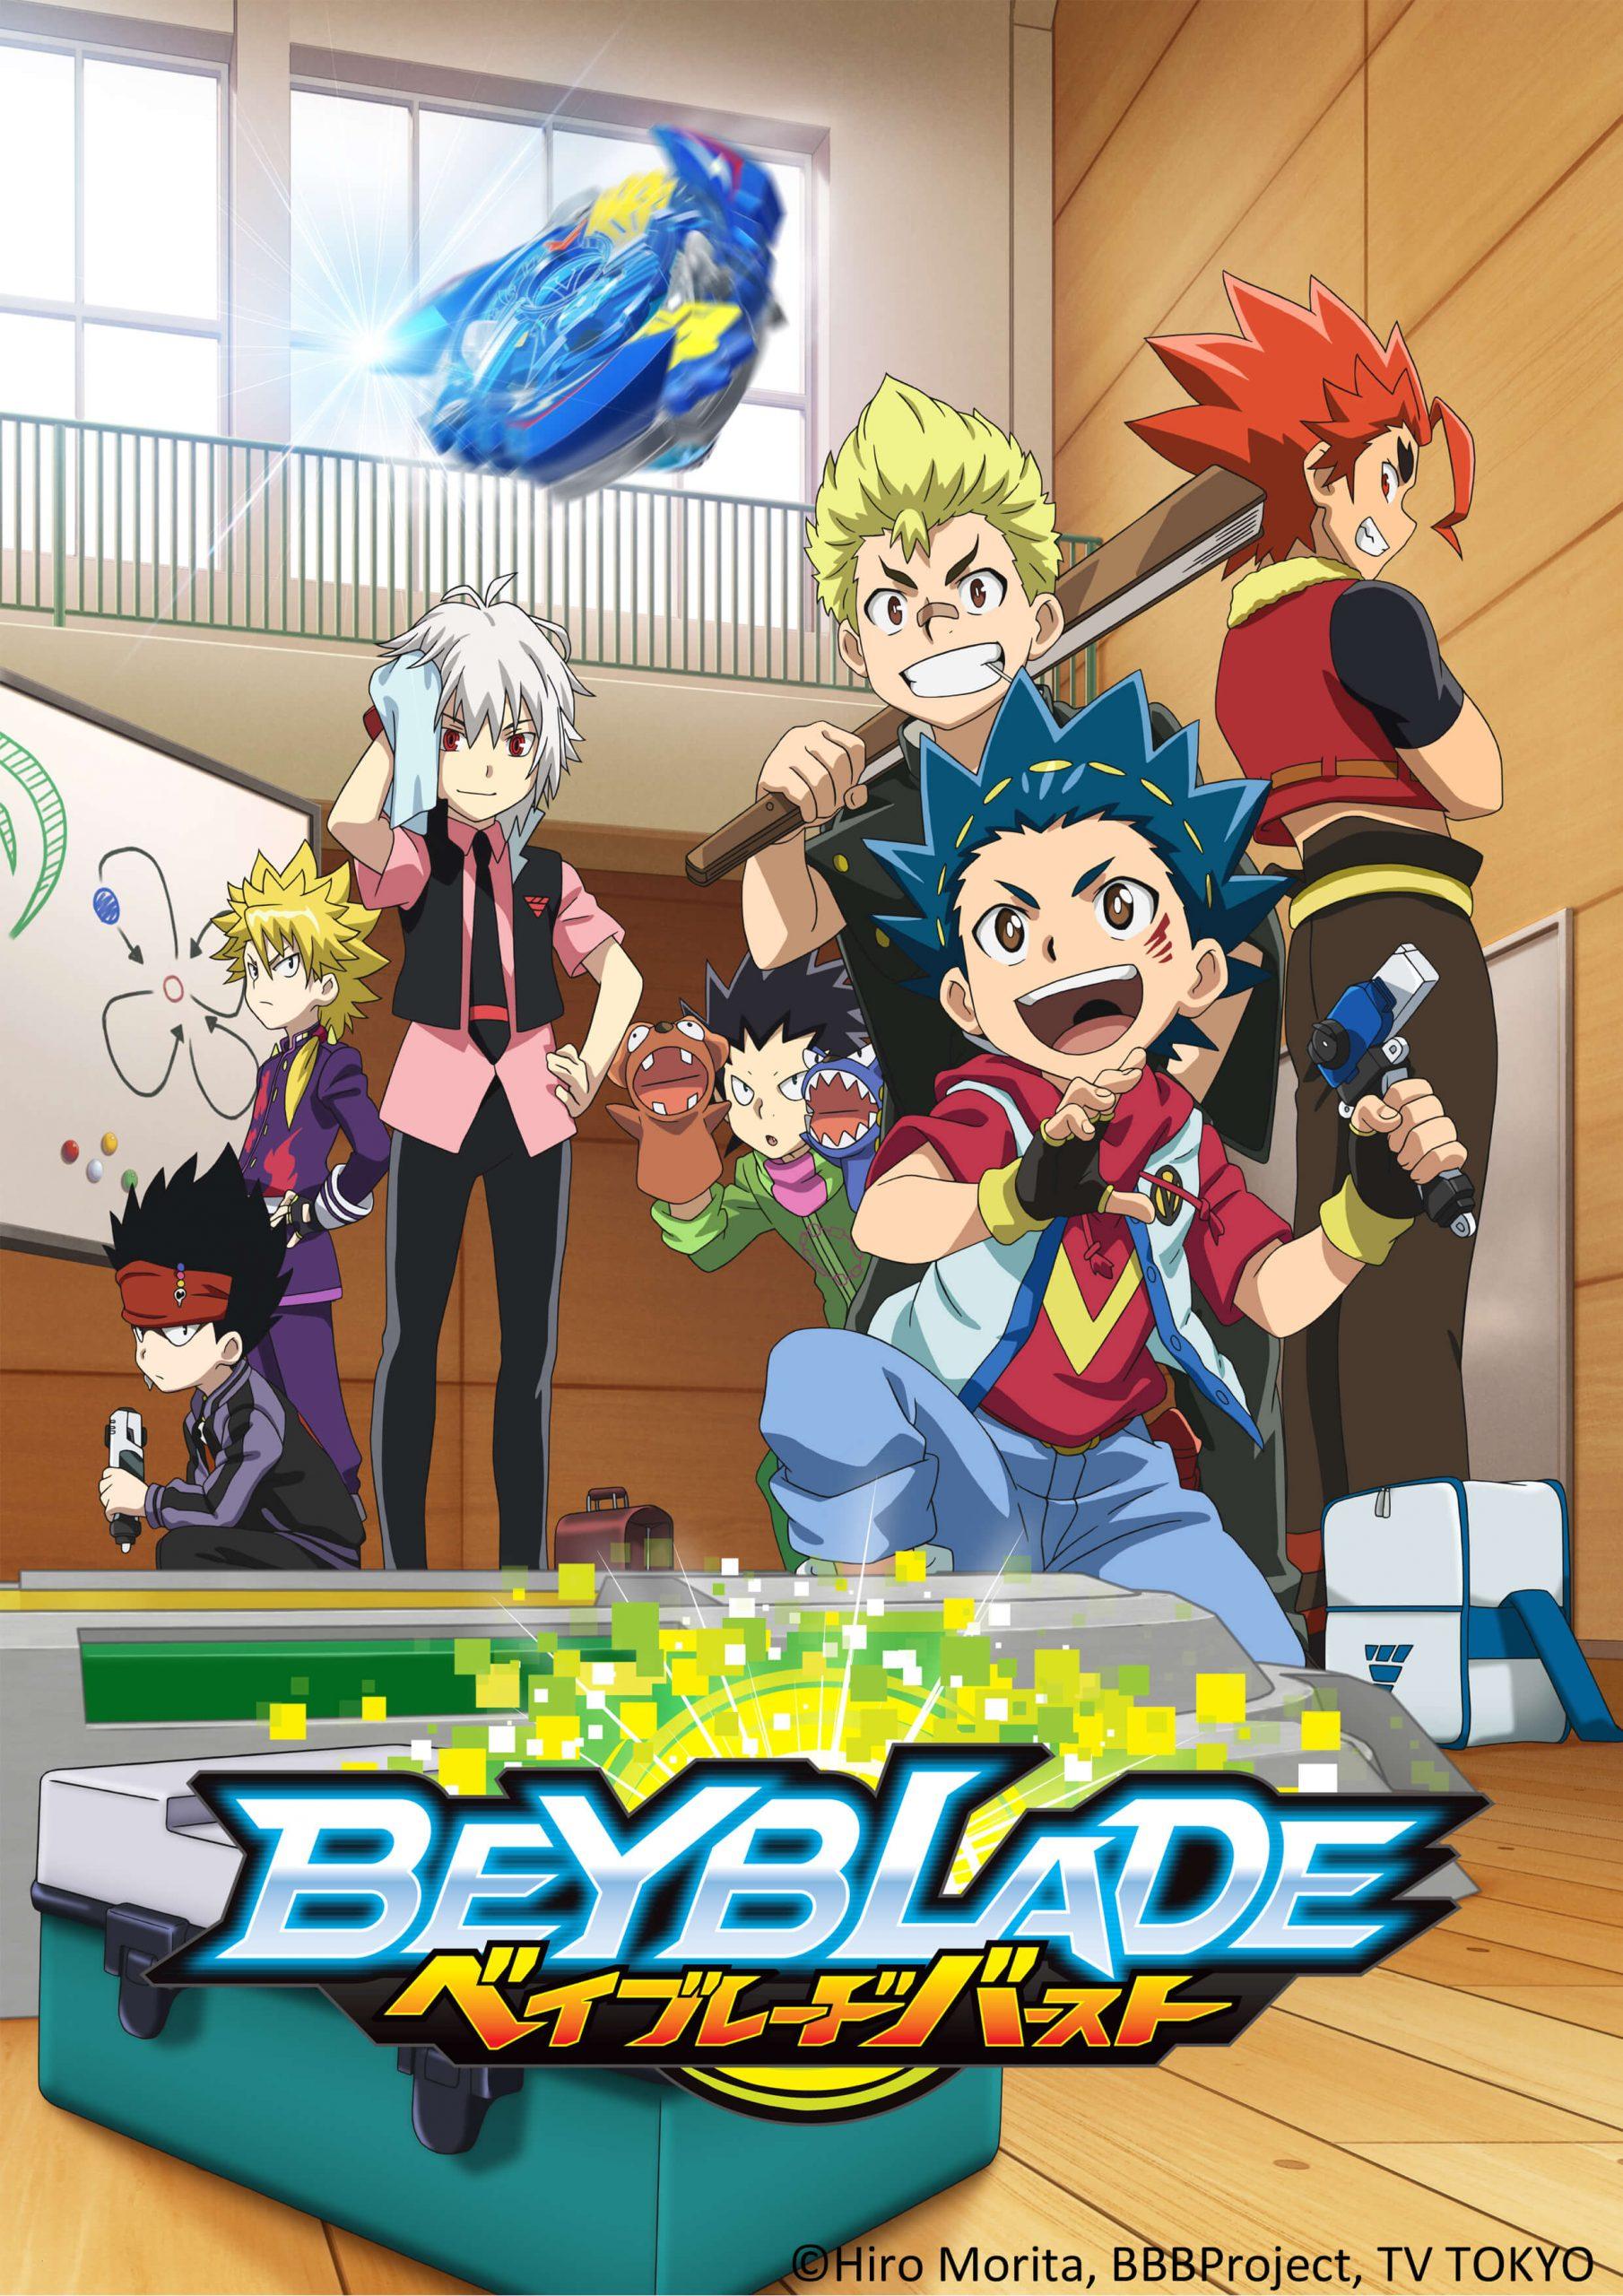 'Beyblade Burst' TV series now airing on RTV Indonesia via Animasia Studio